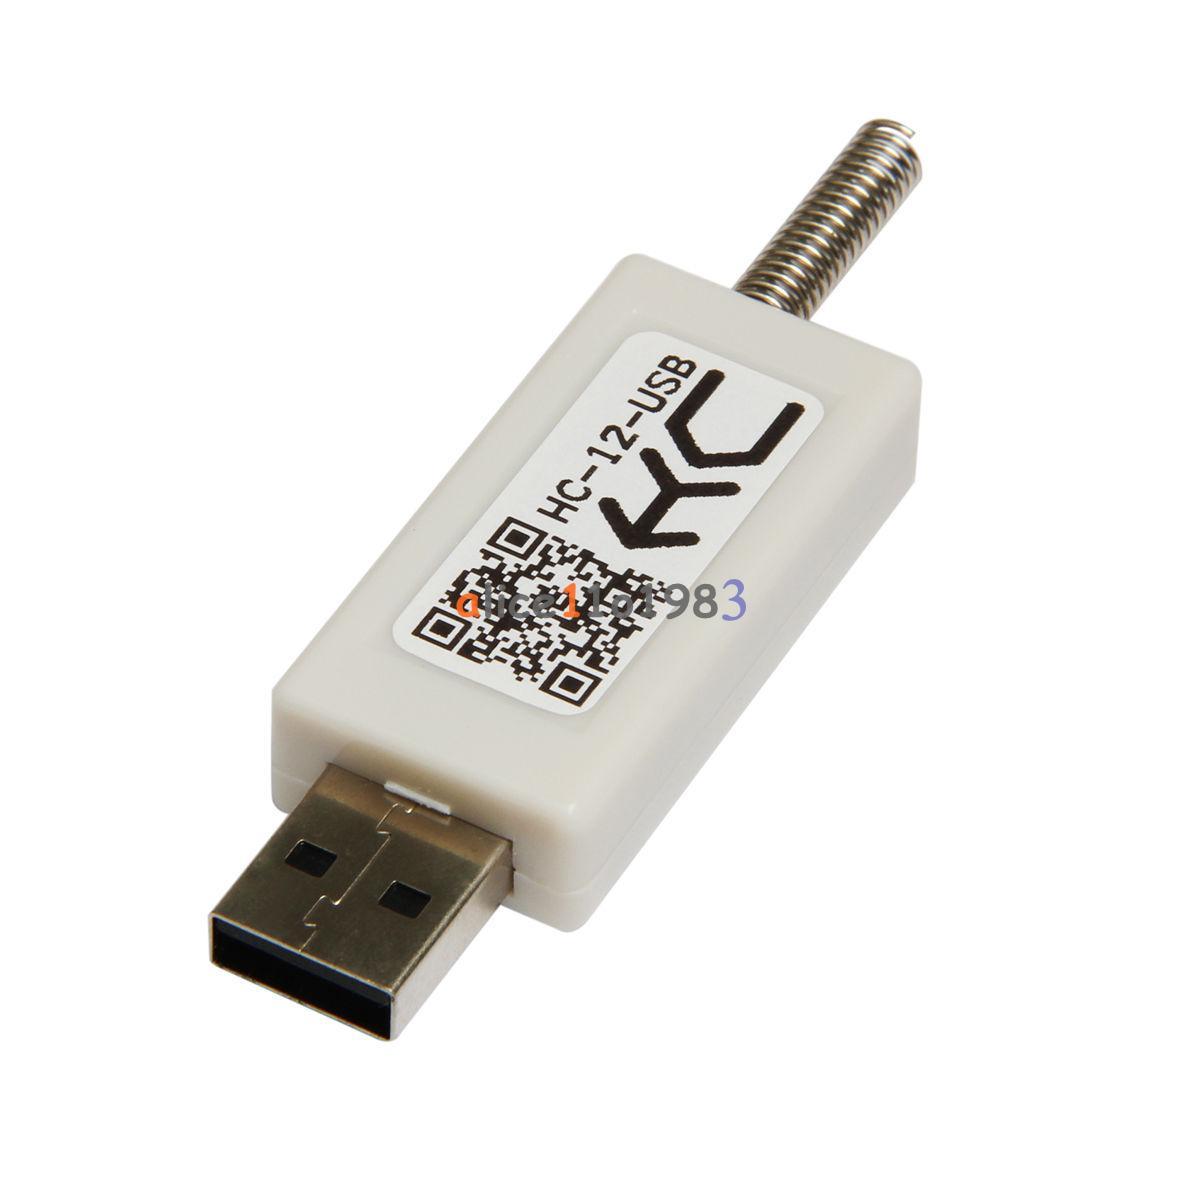 Hc usb cc mhz wireless serial port module